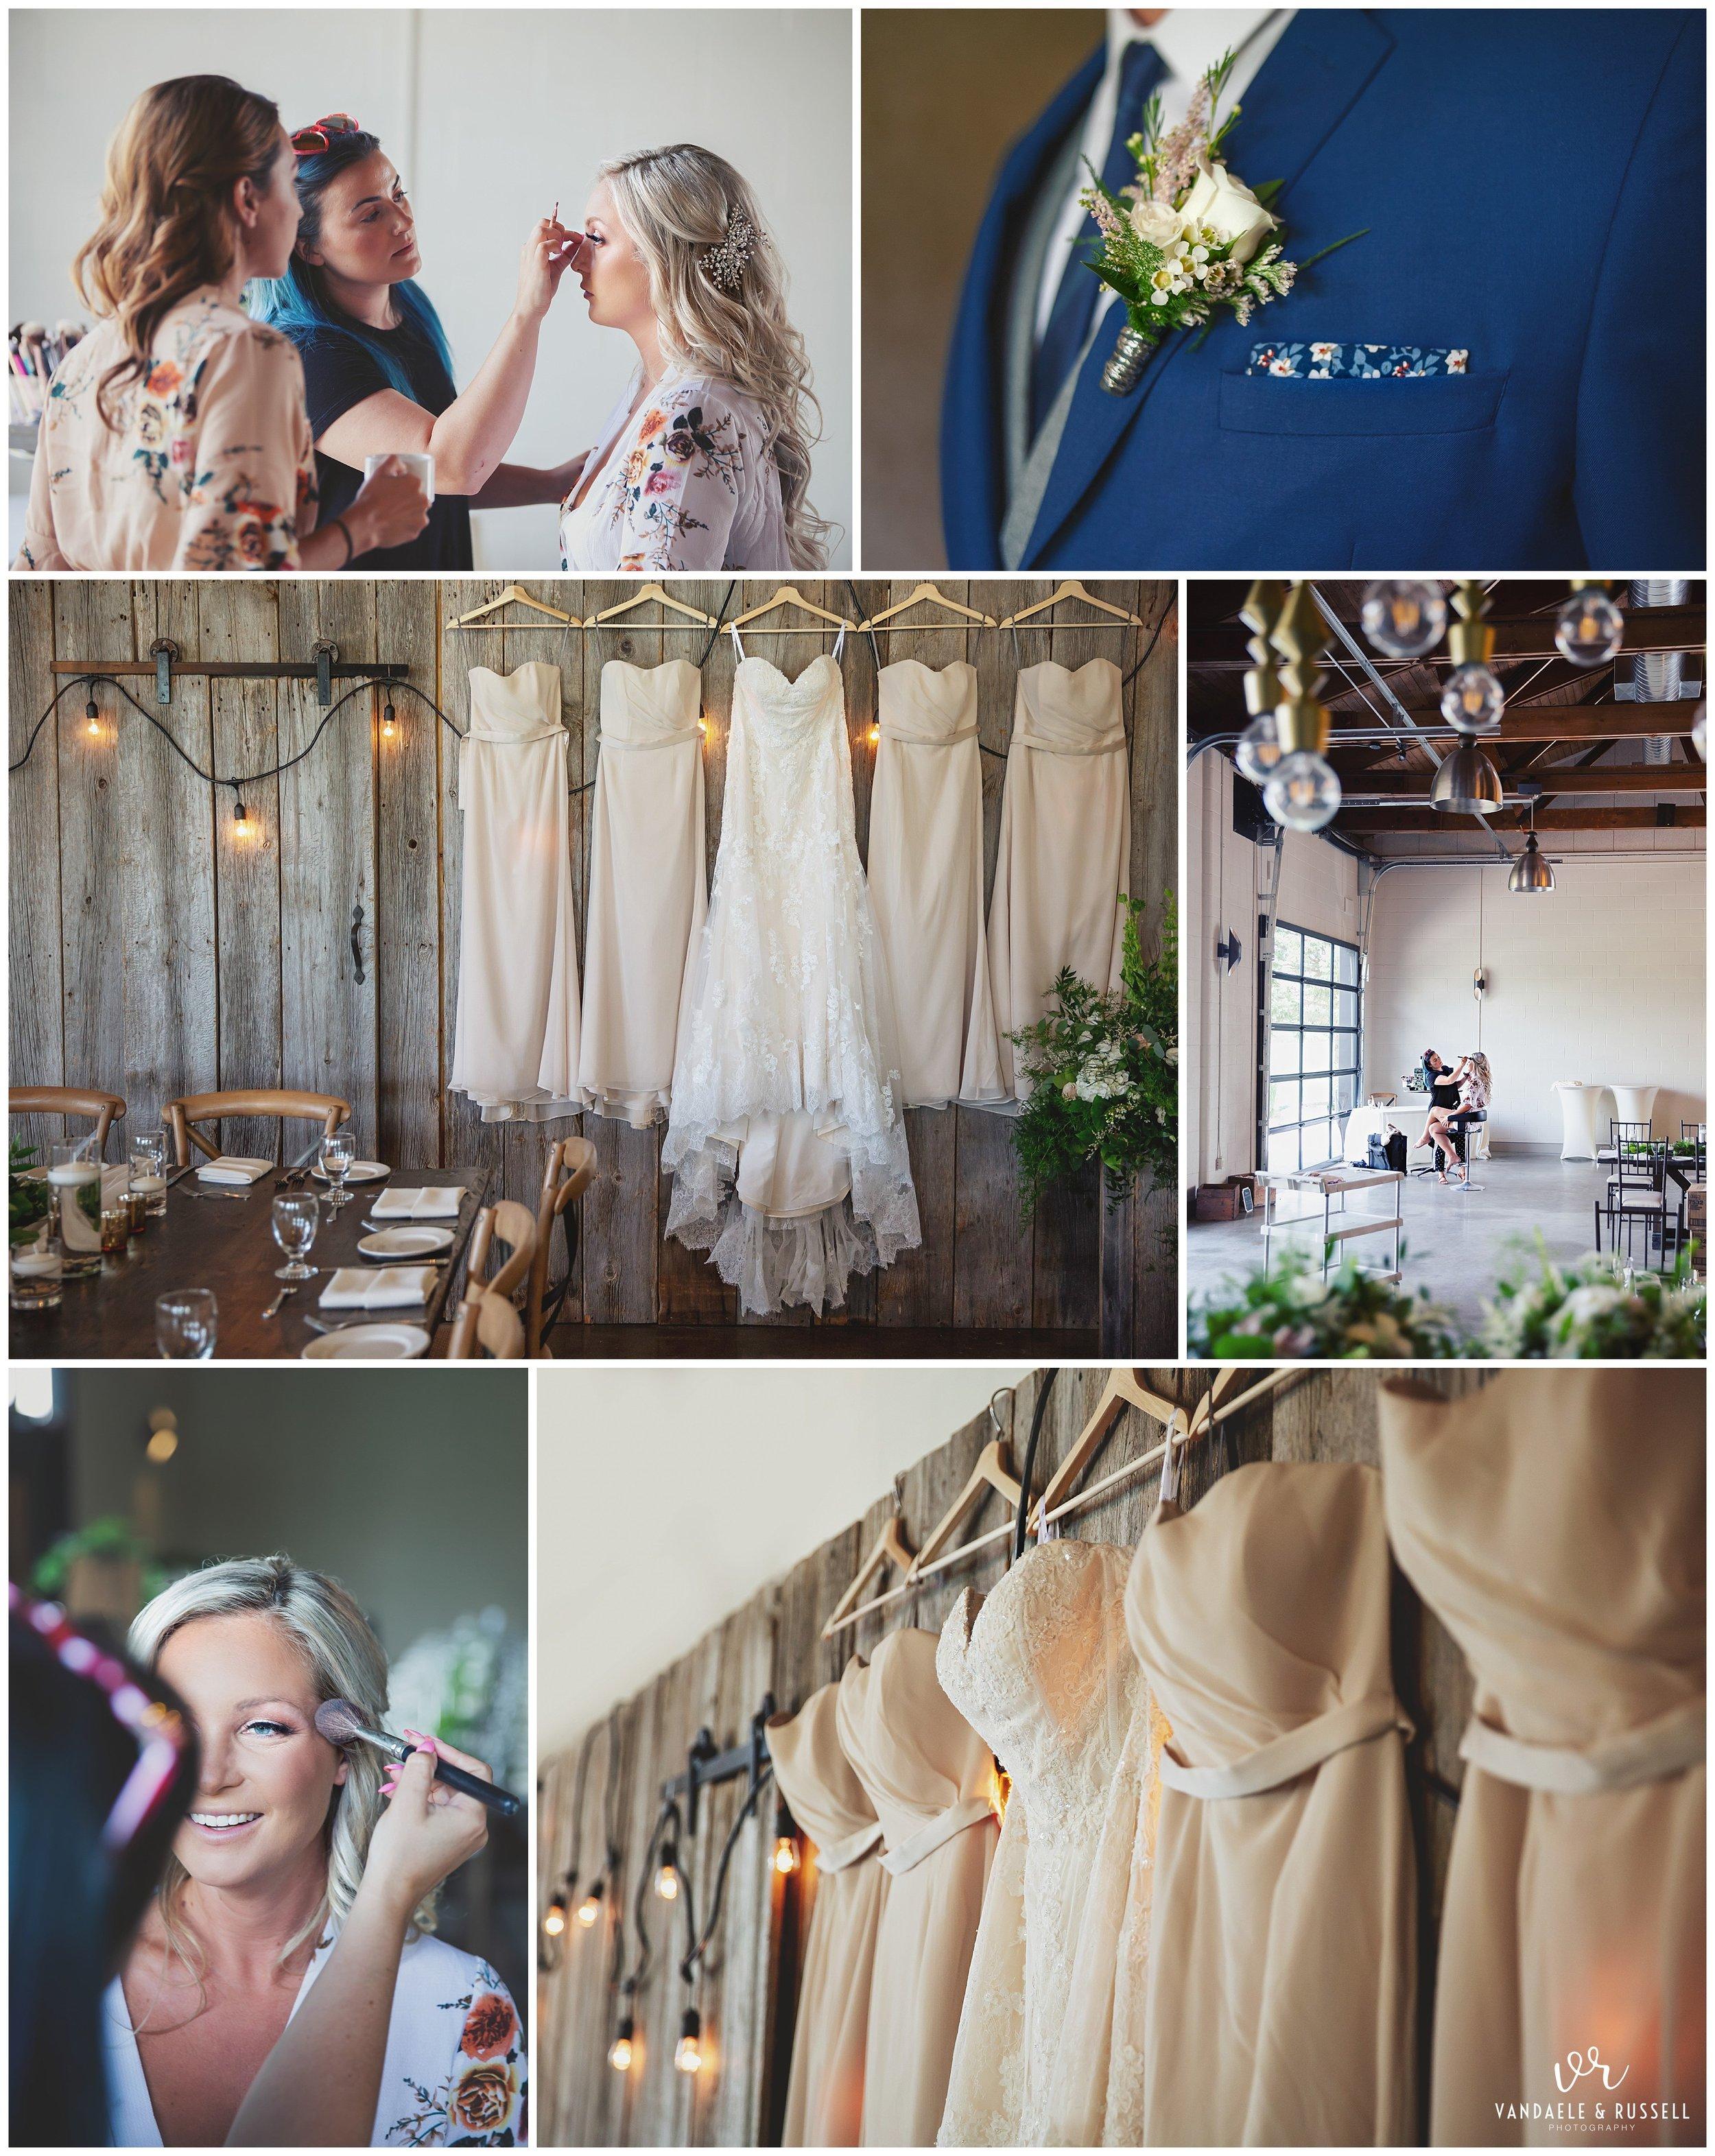 VanDaele-Russell-Wedding-Photography-London-Toronto-Ontario_0144.jpg